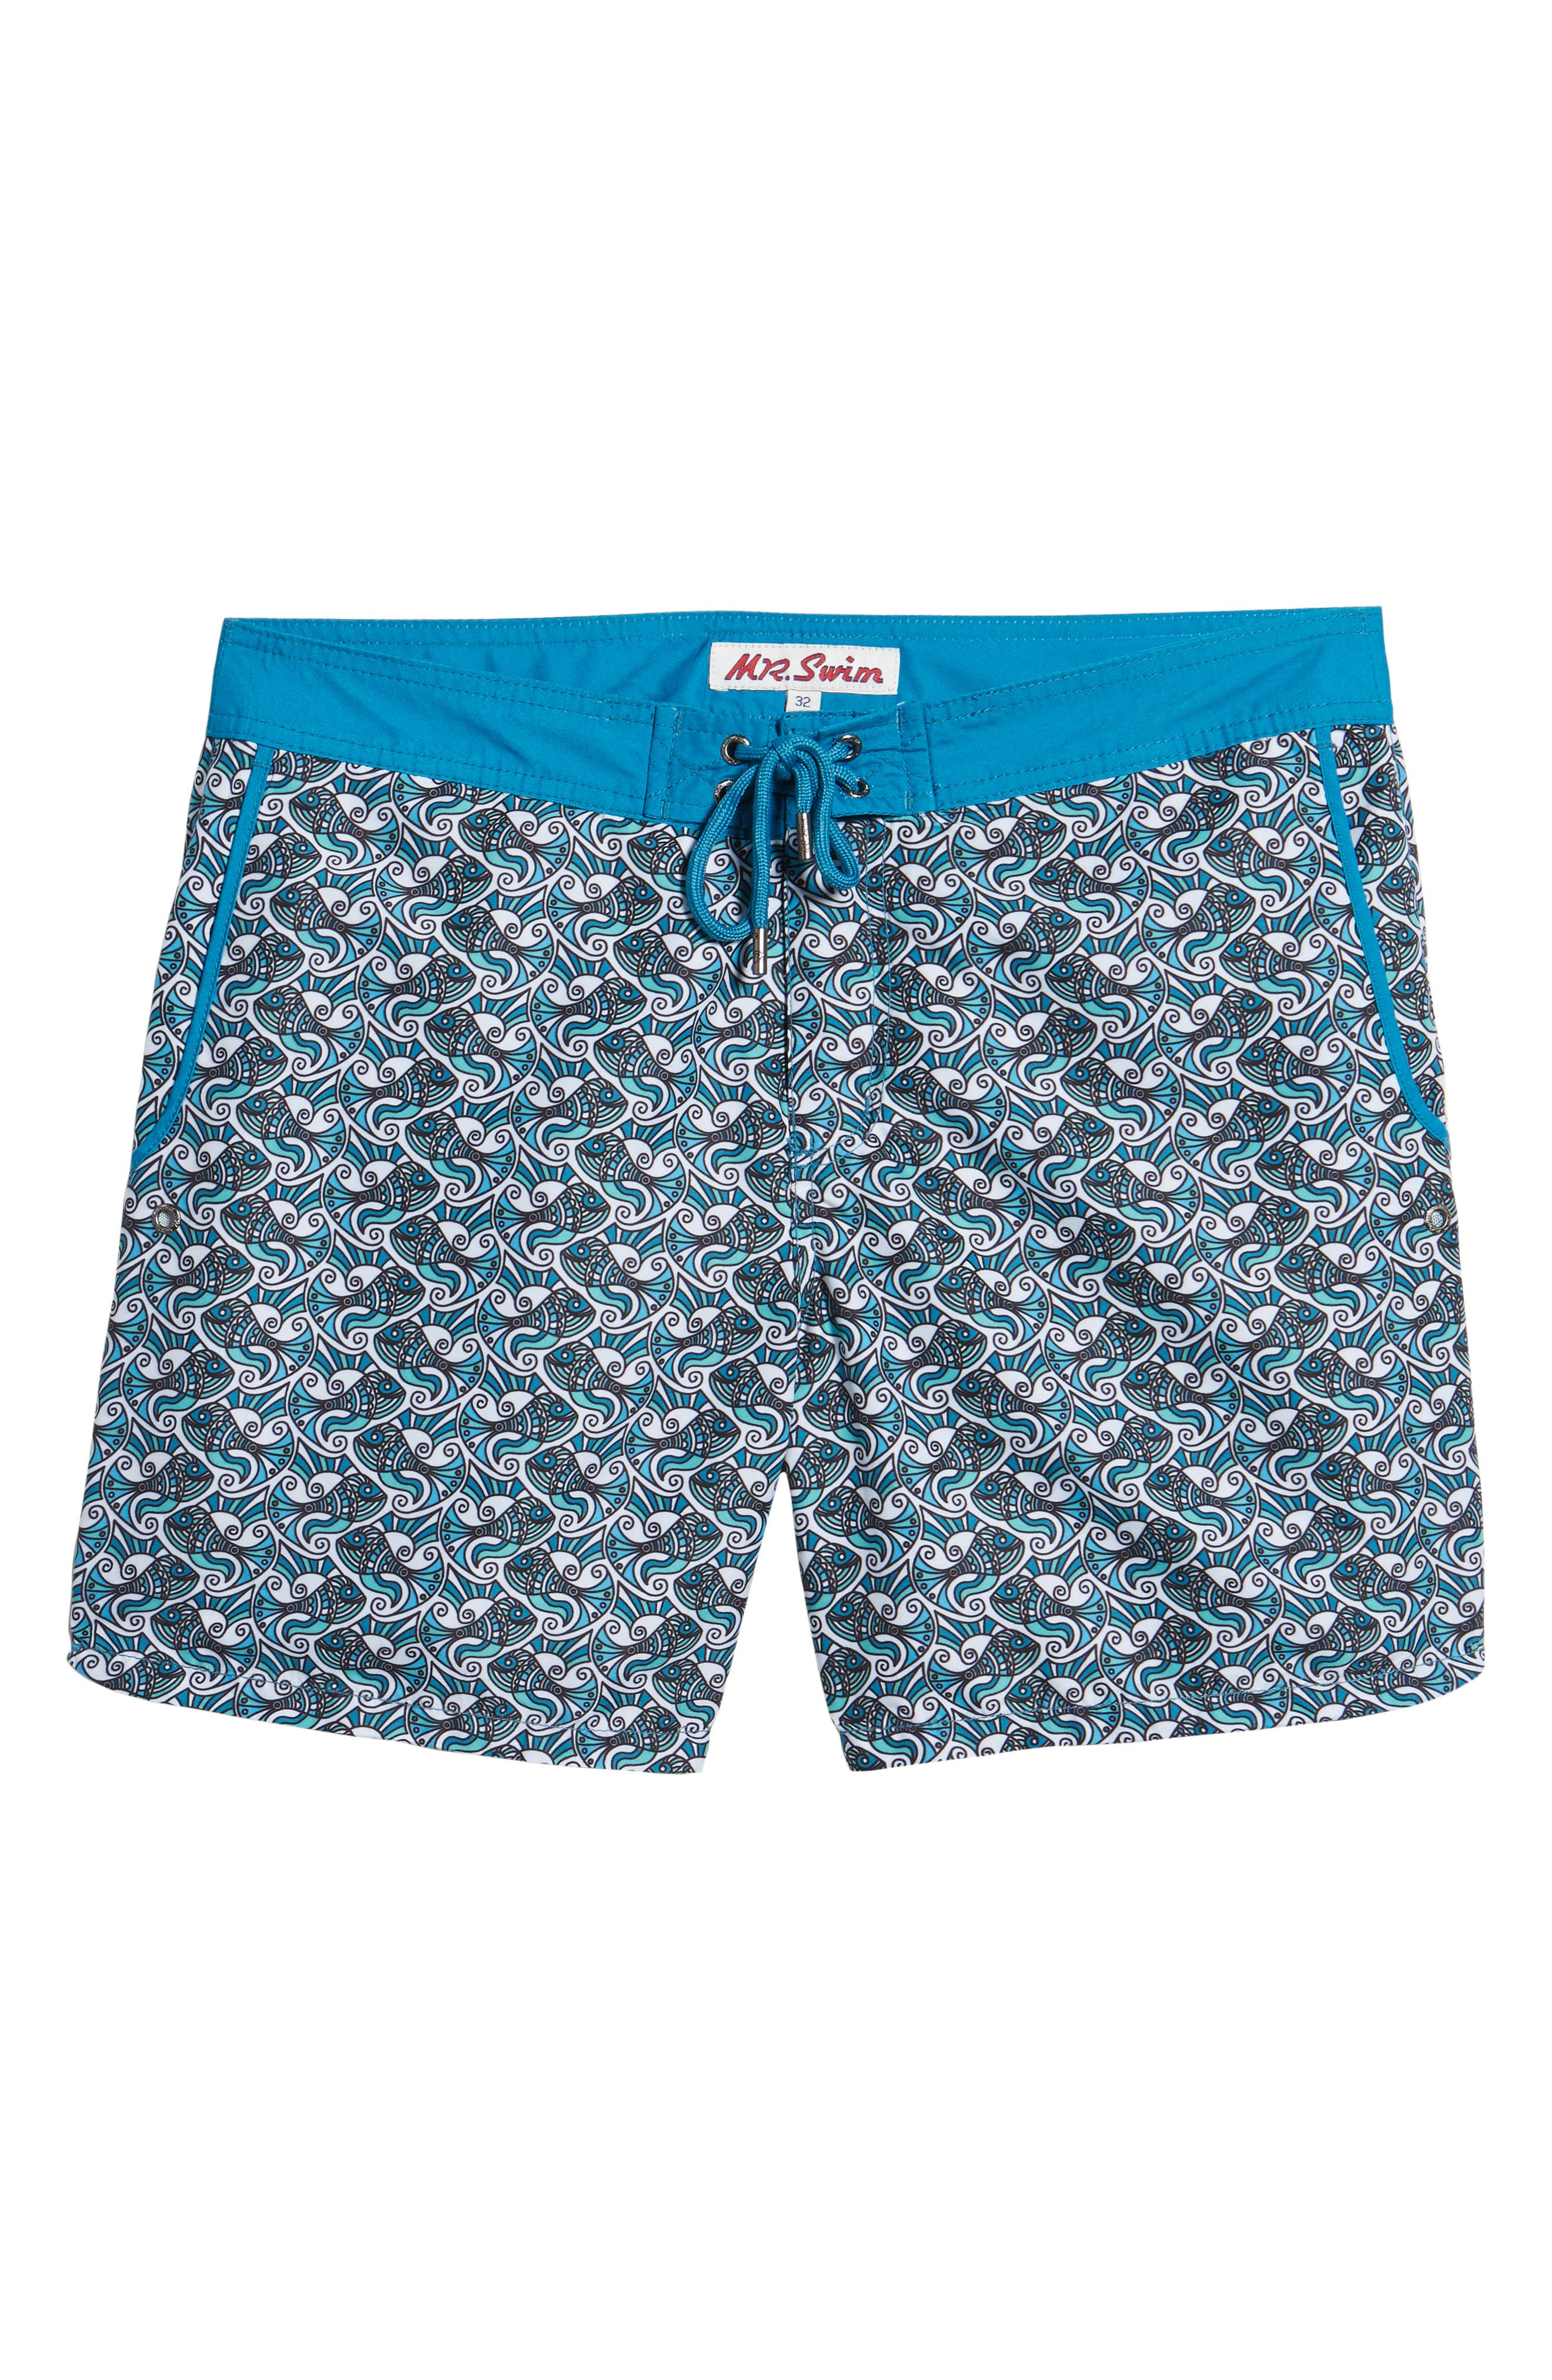 Mr. Swim Fish Swirls Print Swim Trunks,                             Alternate thumbnail 6, color,                             440